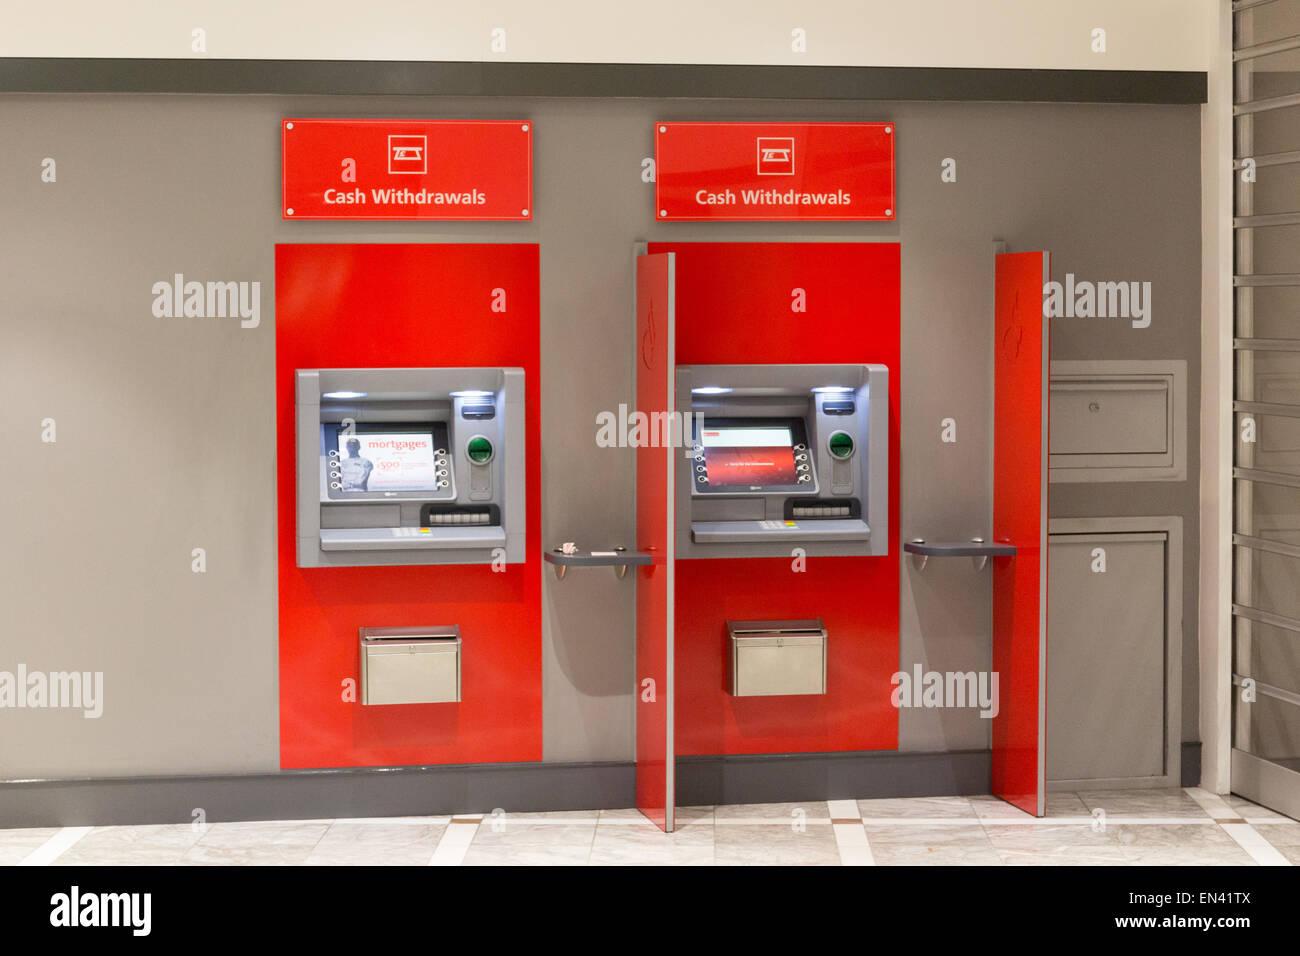 Santander bank ATM machines Stock Photo: 81838538 - Alamy